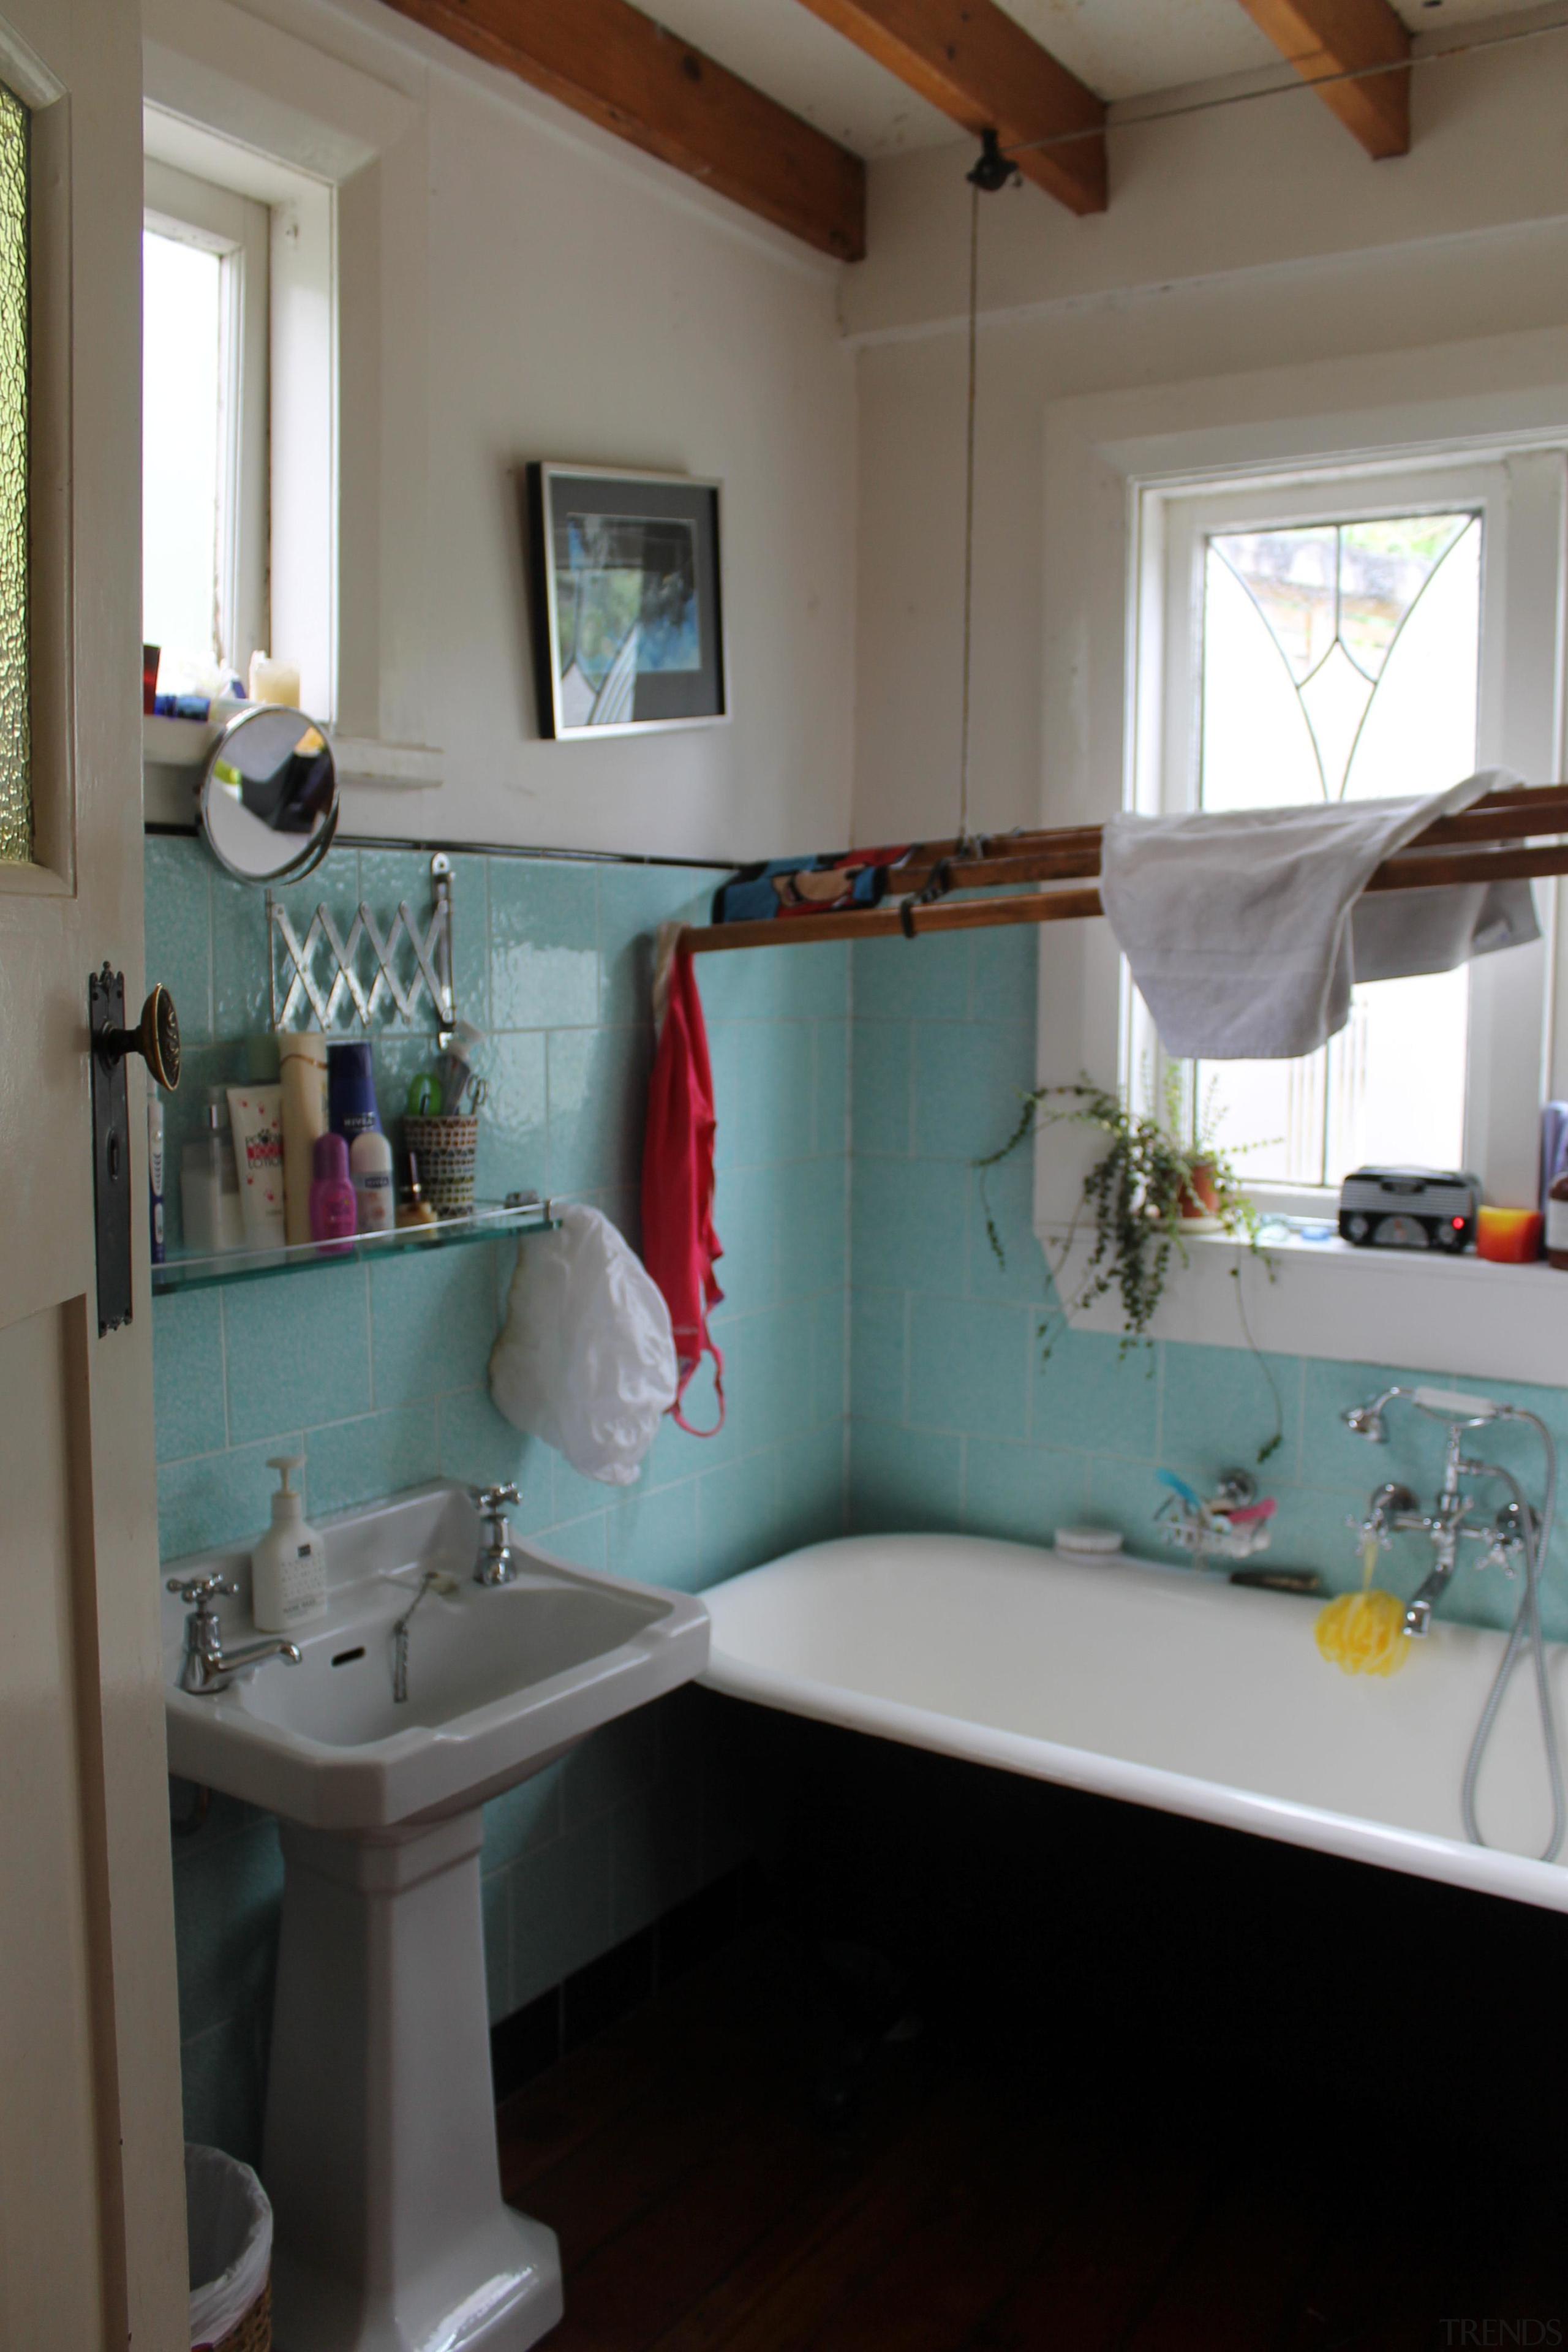 The original main bathroom - Existing main bathroom bathroom, countertop, floor, furniture, home, house, interior design, plumbing fixture, room, sink, table, window, gray